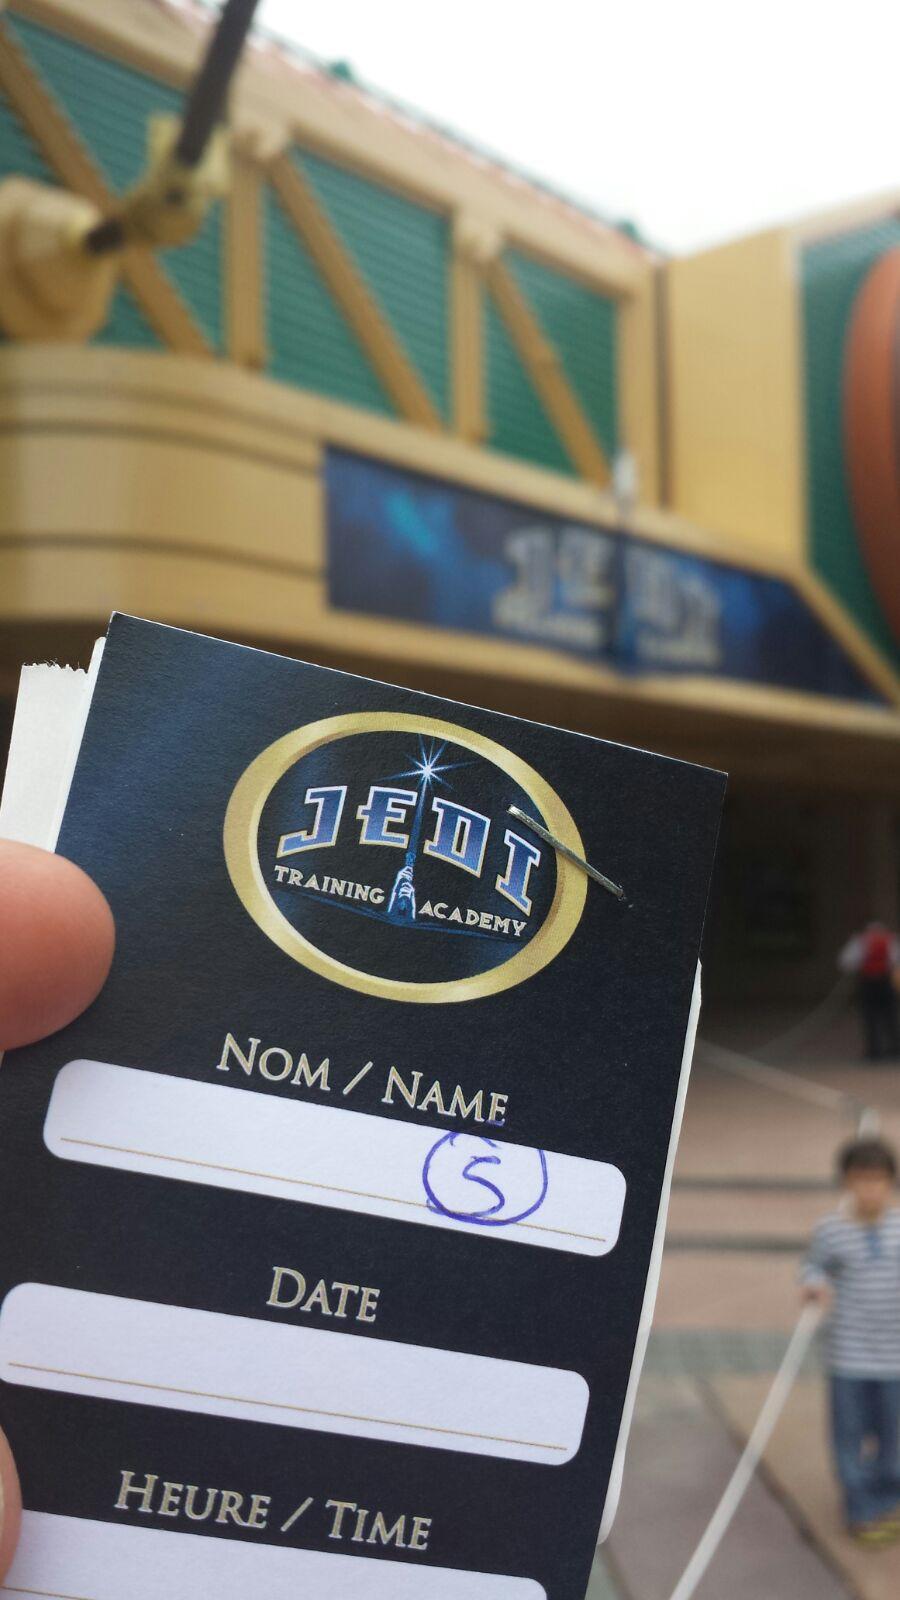 Jedi Training Academy - Pagina 6 Img-2033